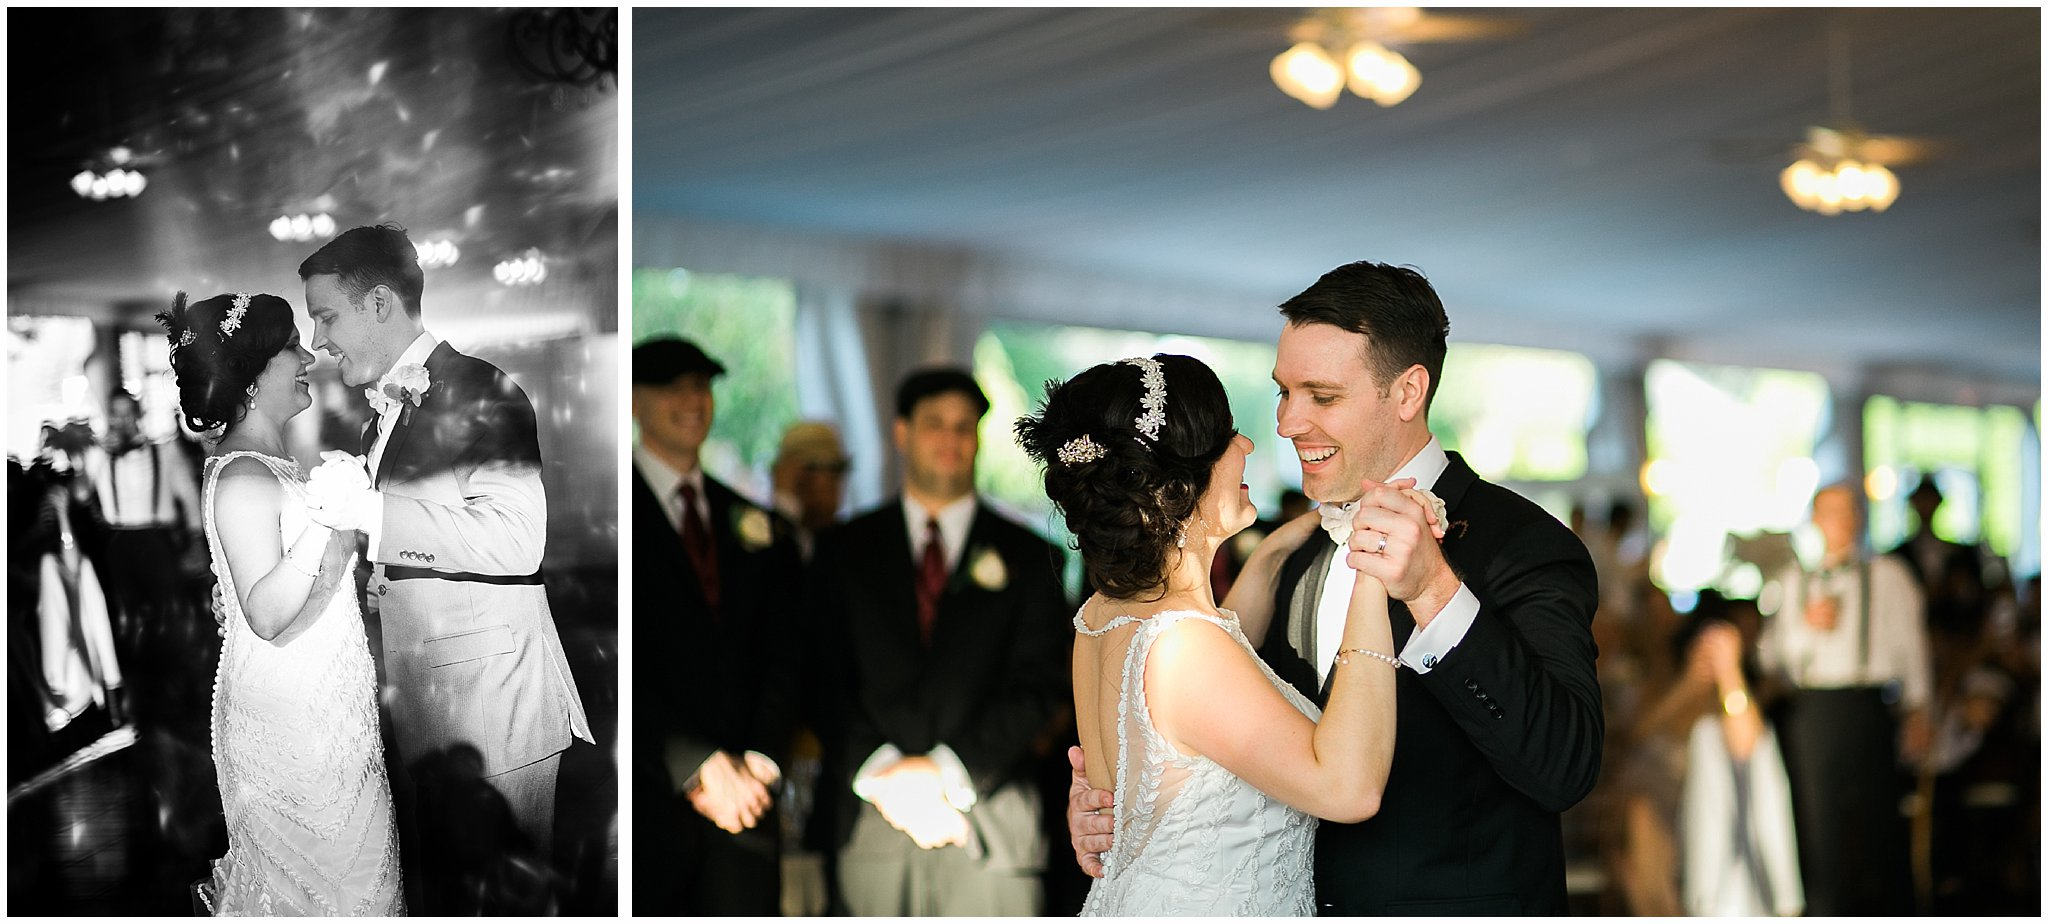 West Hills Country Club Wedding Gatsby Wedding Roaring Twenties Wedding Hudson Valley Wedding Photographer Sweet Alice Photography62.jpg